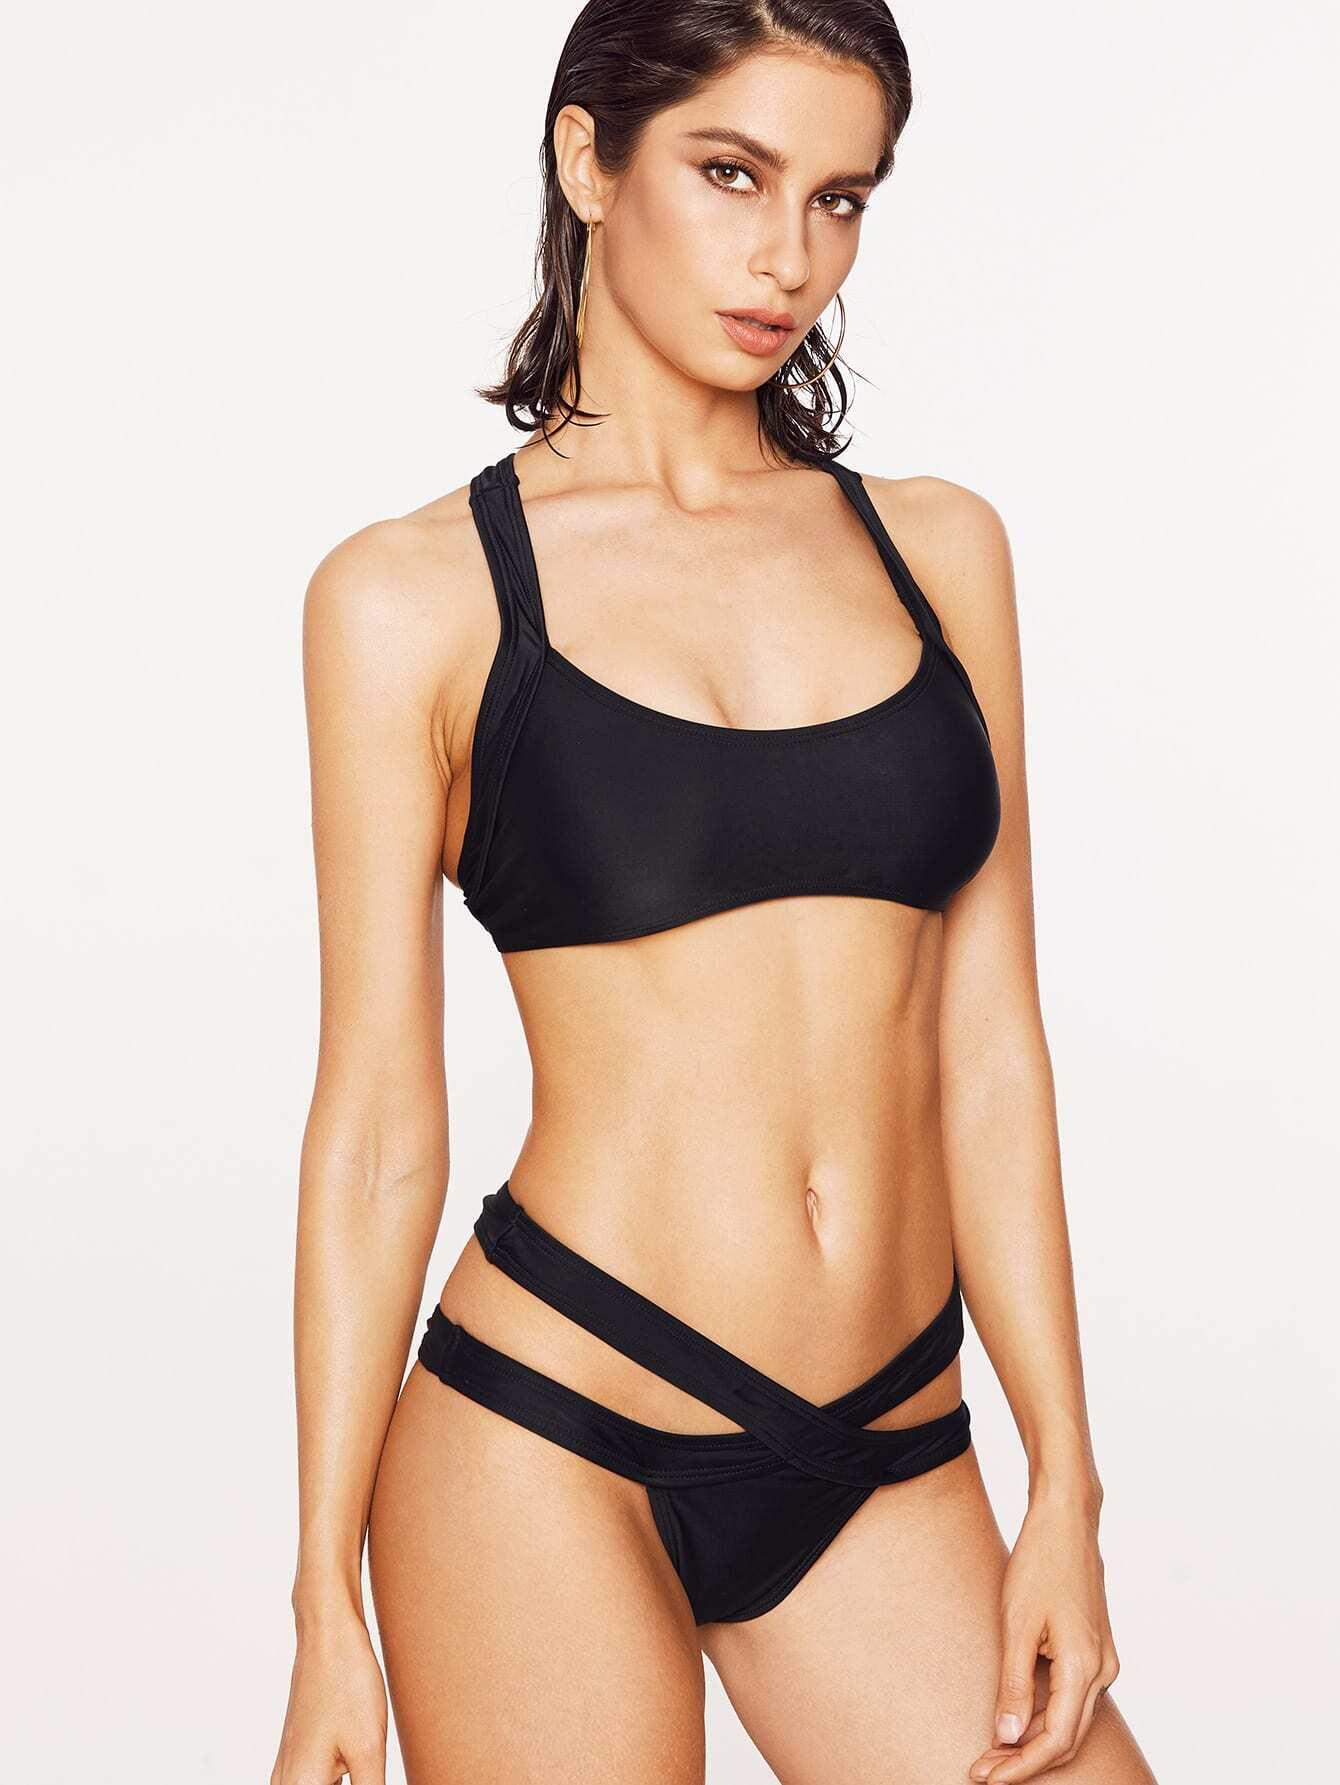 Black Criss Cross Detail Sexy Bikini Set swimwear170214322